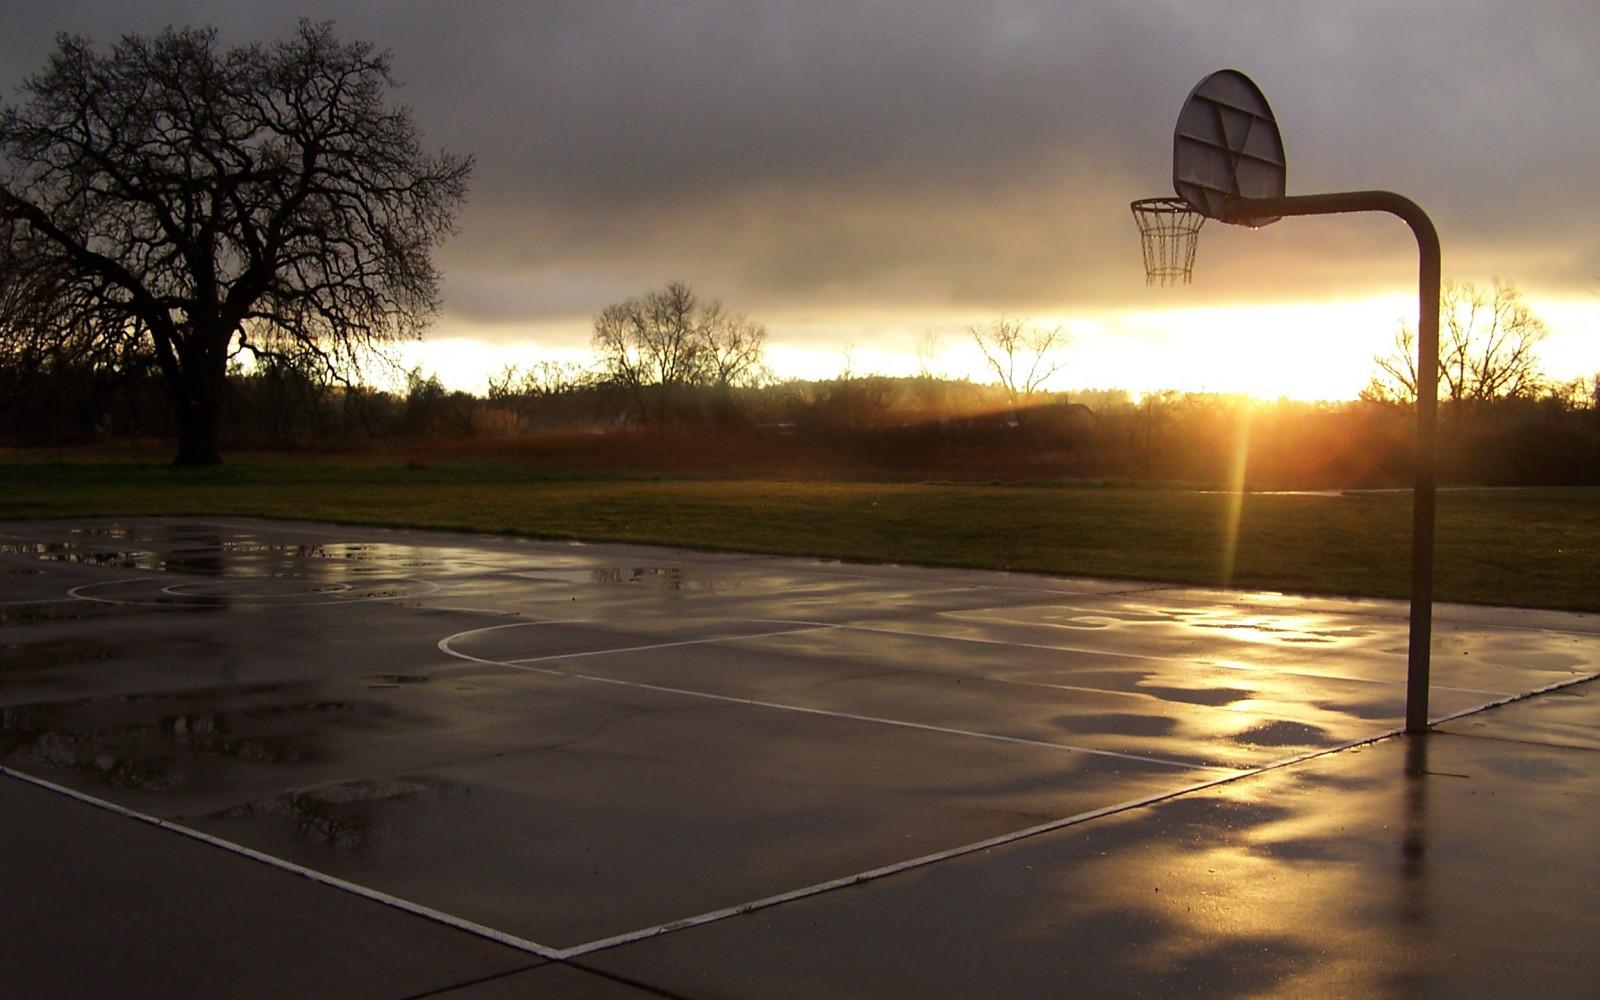 Impianti sportivi sportilluminated illuminazione per campi